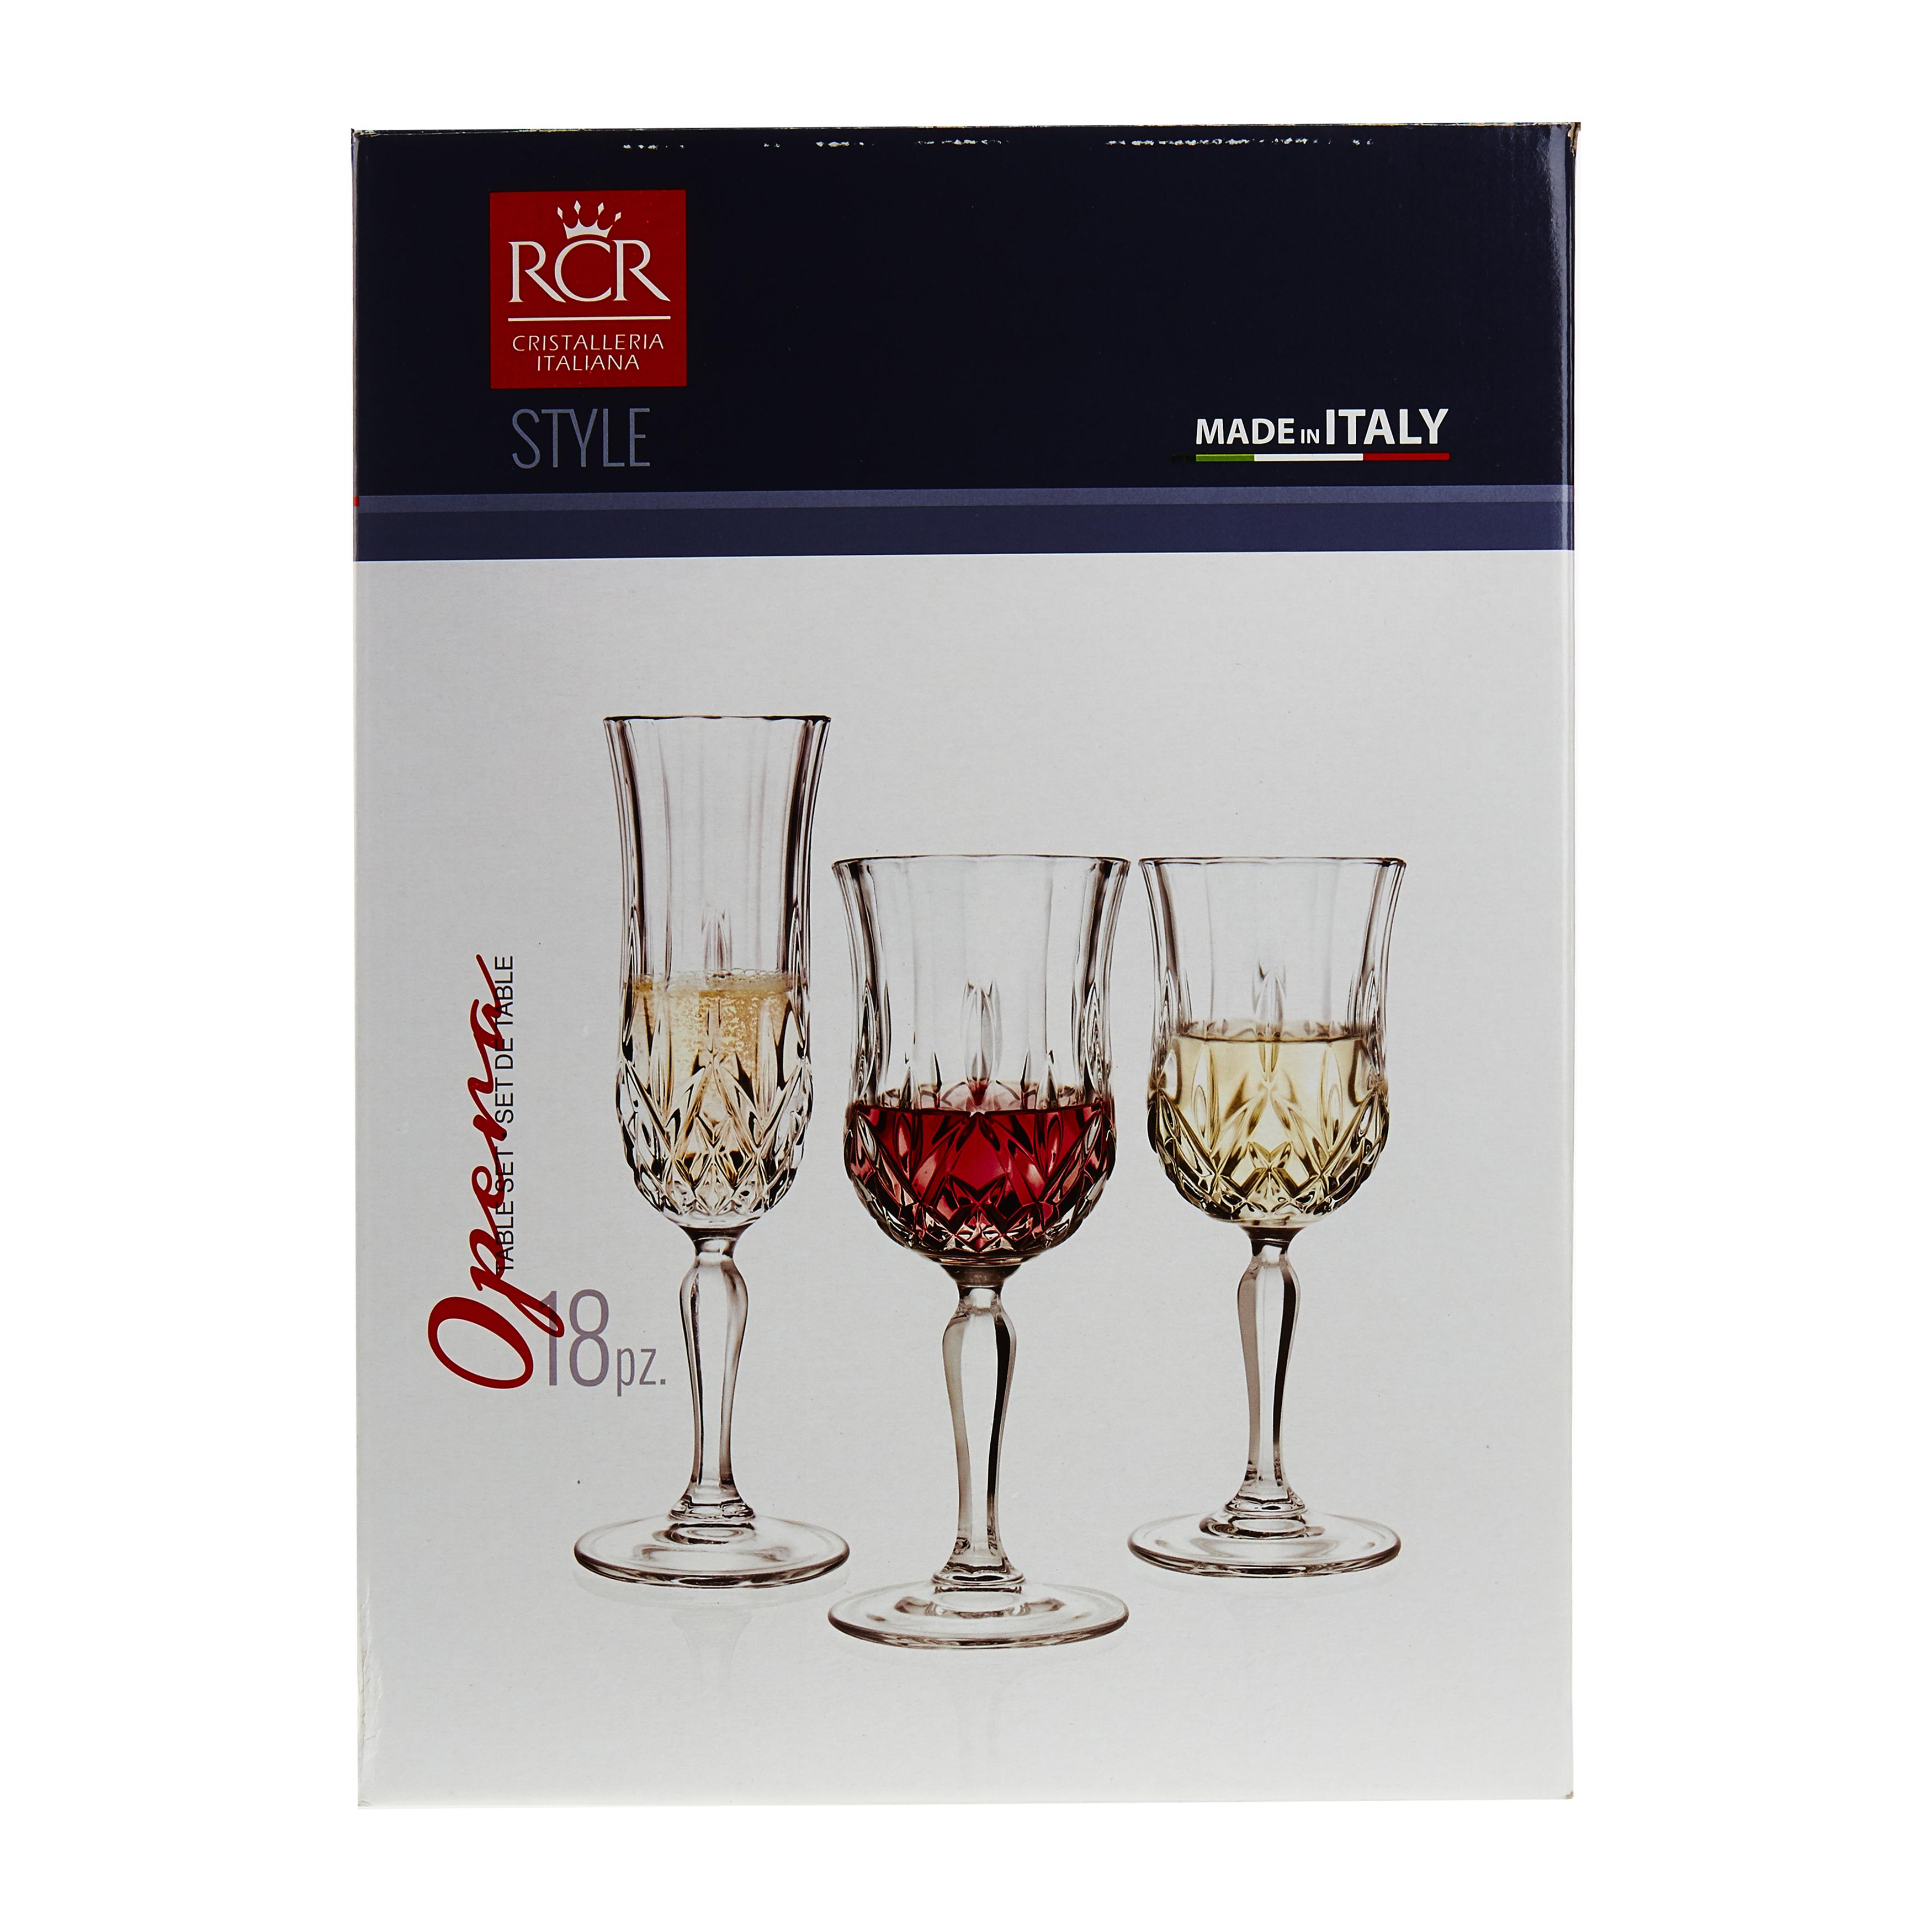 Набор 18 предм OPERA (шамп 6 шт кр вино 230 мл 6 шт бел вино 160 мл 6 шт) Rcr